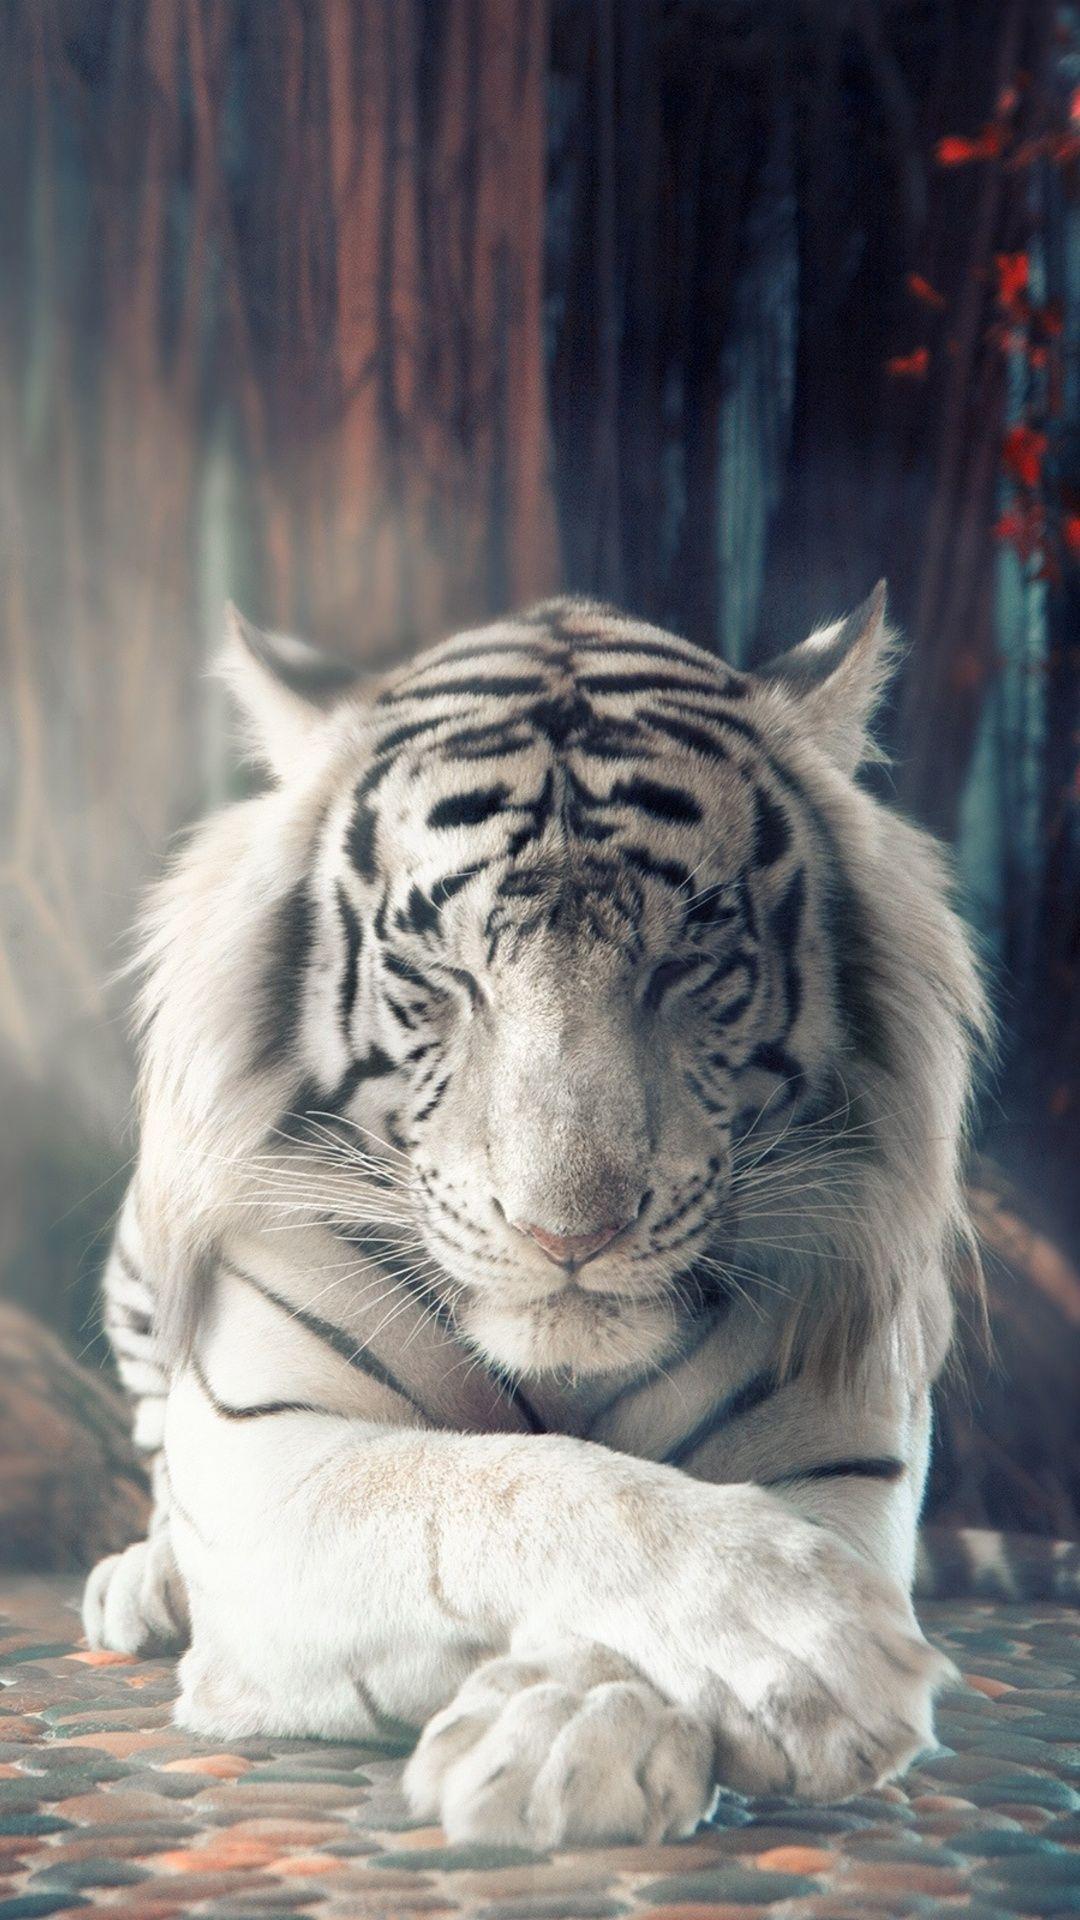 Tiger Wallpaper Full Hd » Hupages » Download Iphone verwandt mit Tierbilder Download